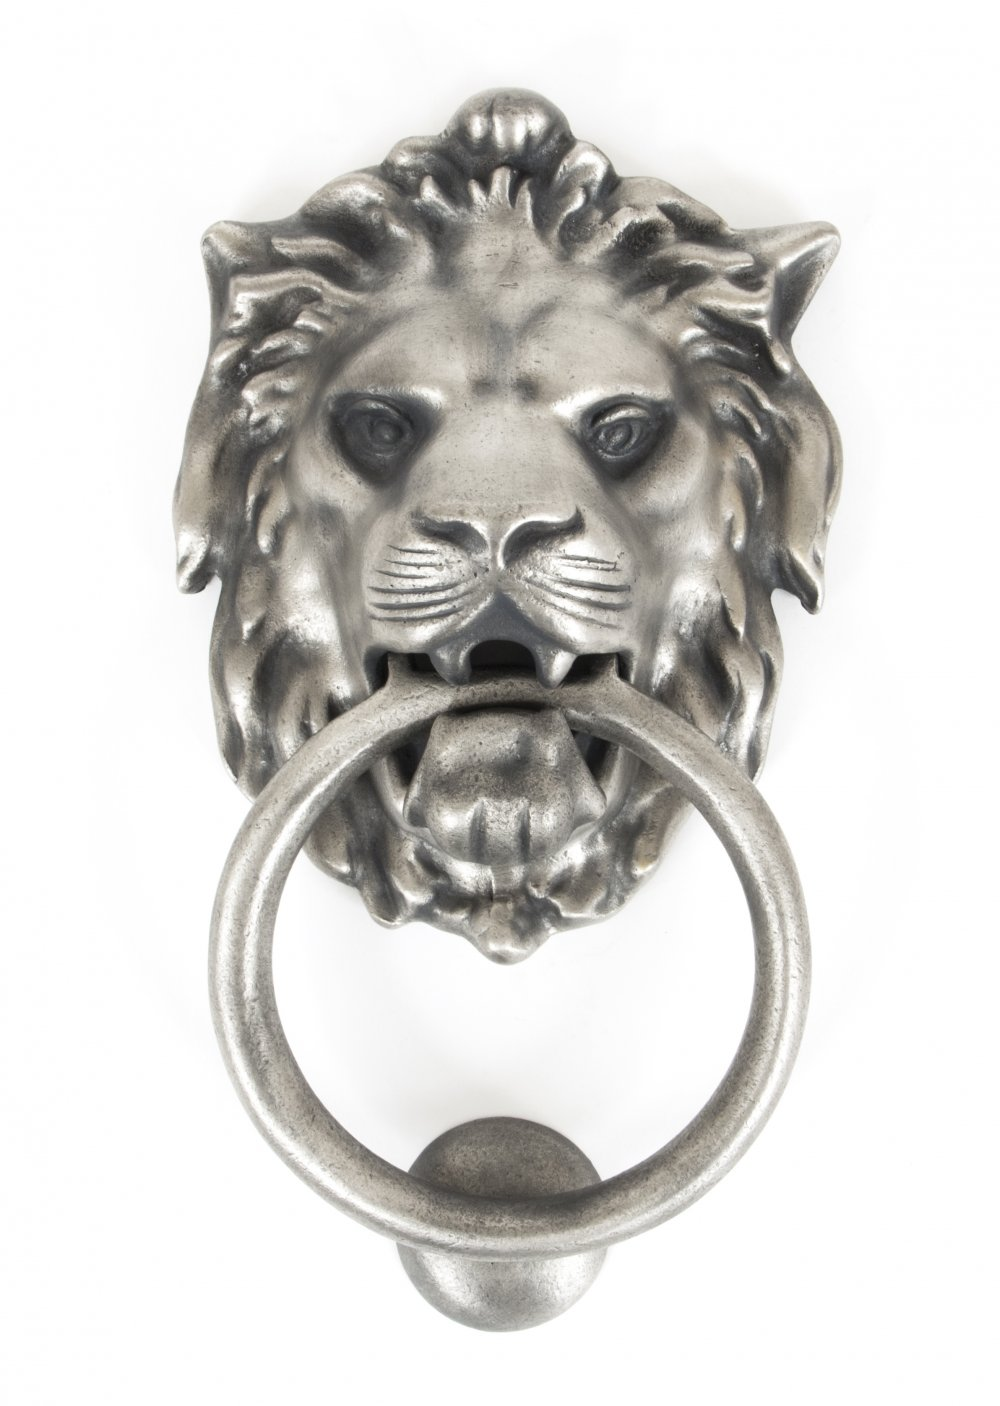 Lion's Head Door Knocker - Antique Pewter image